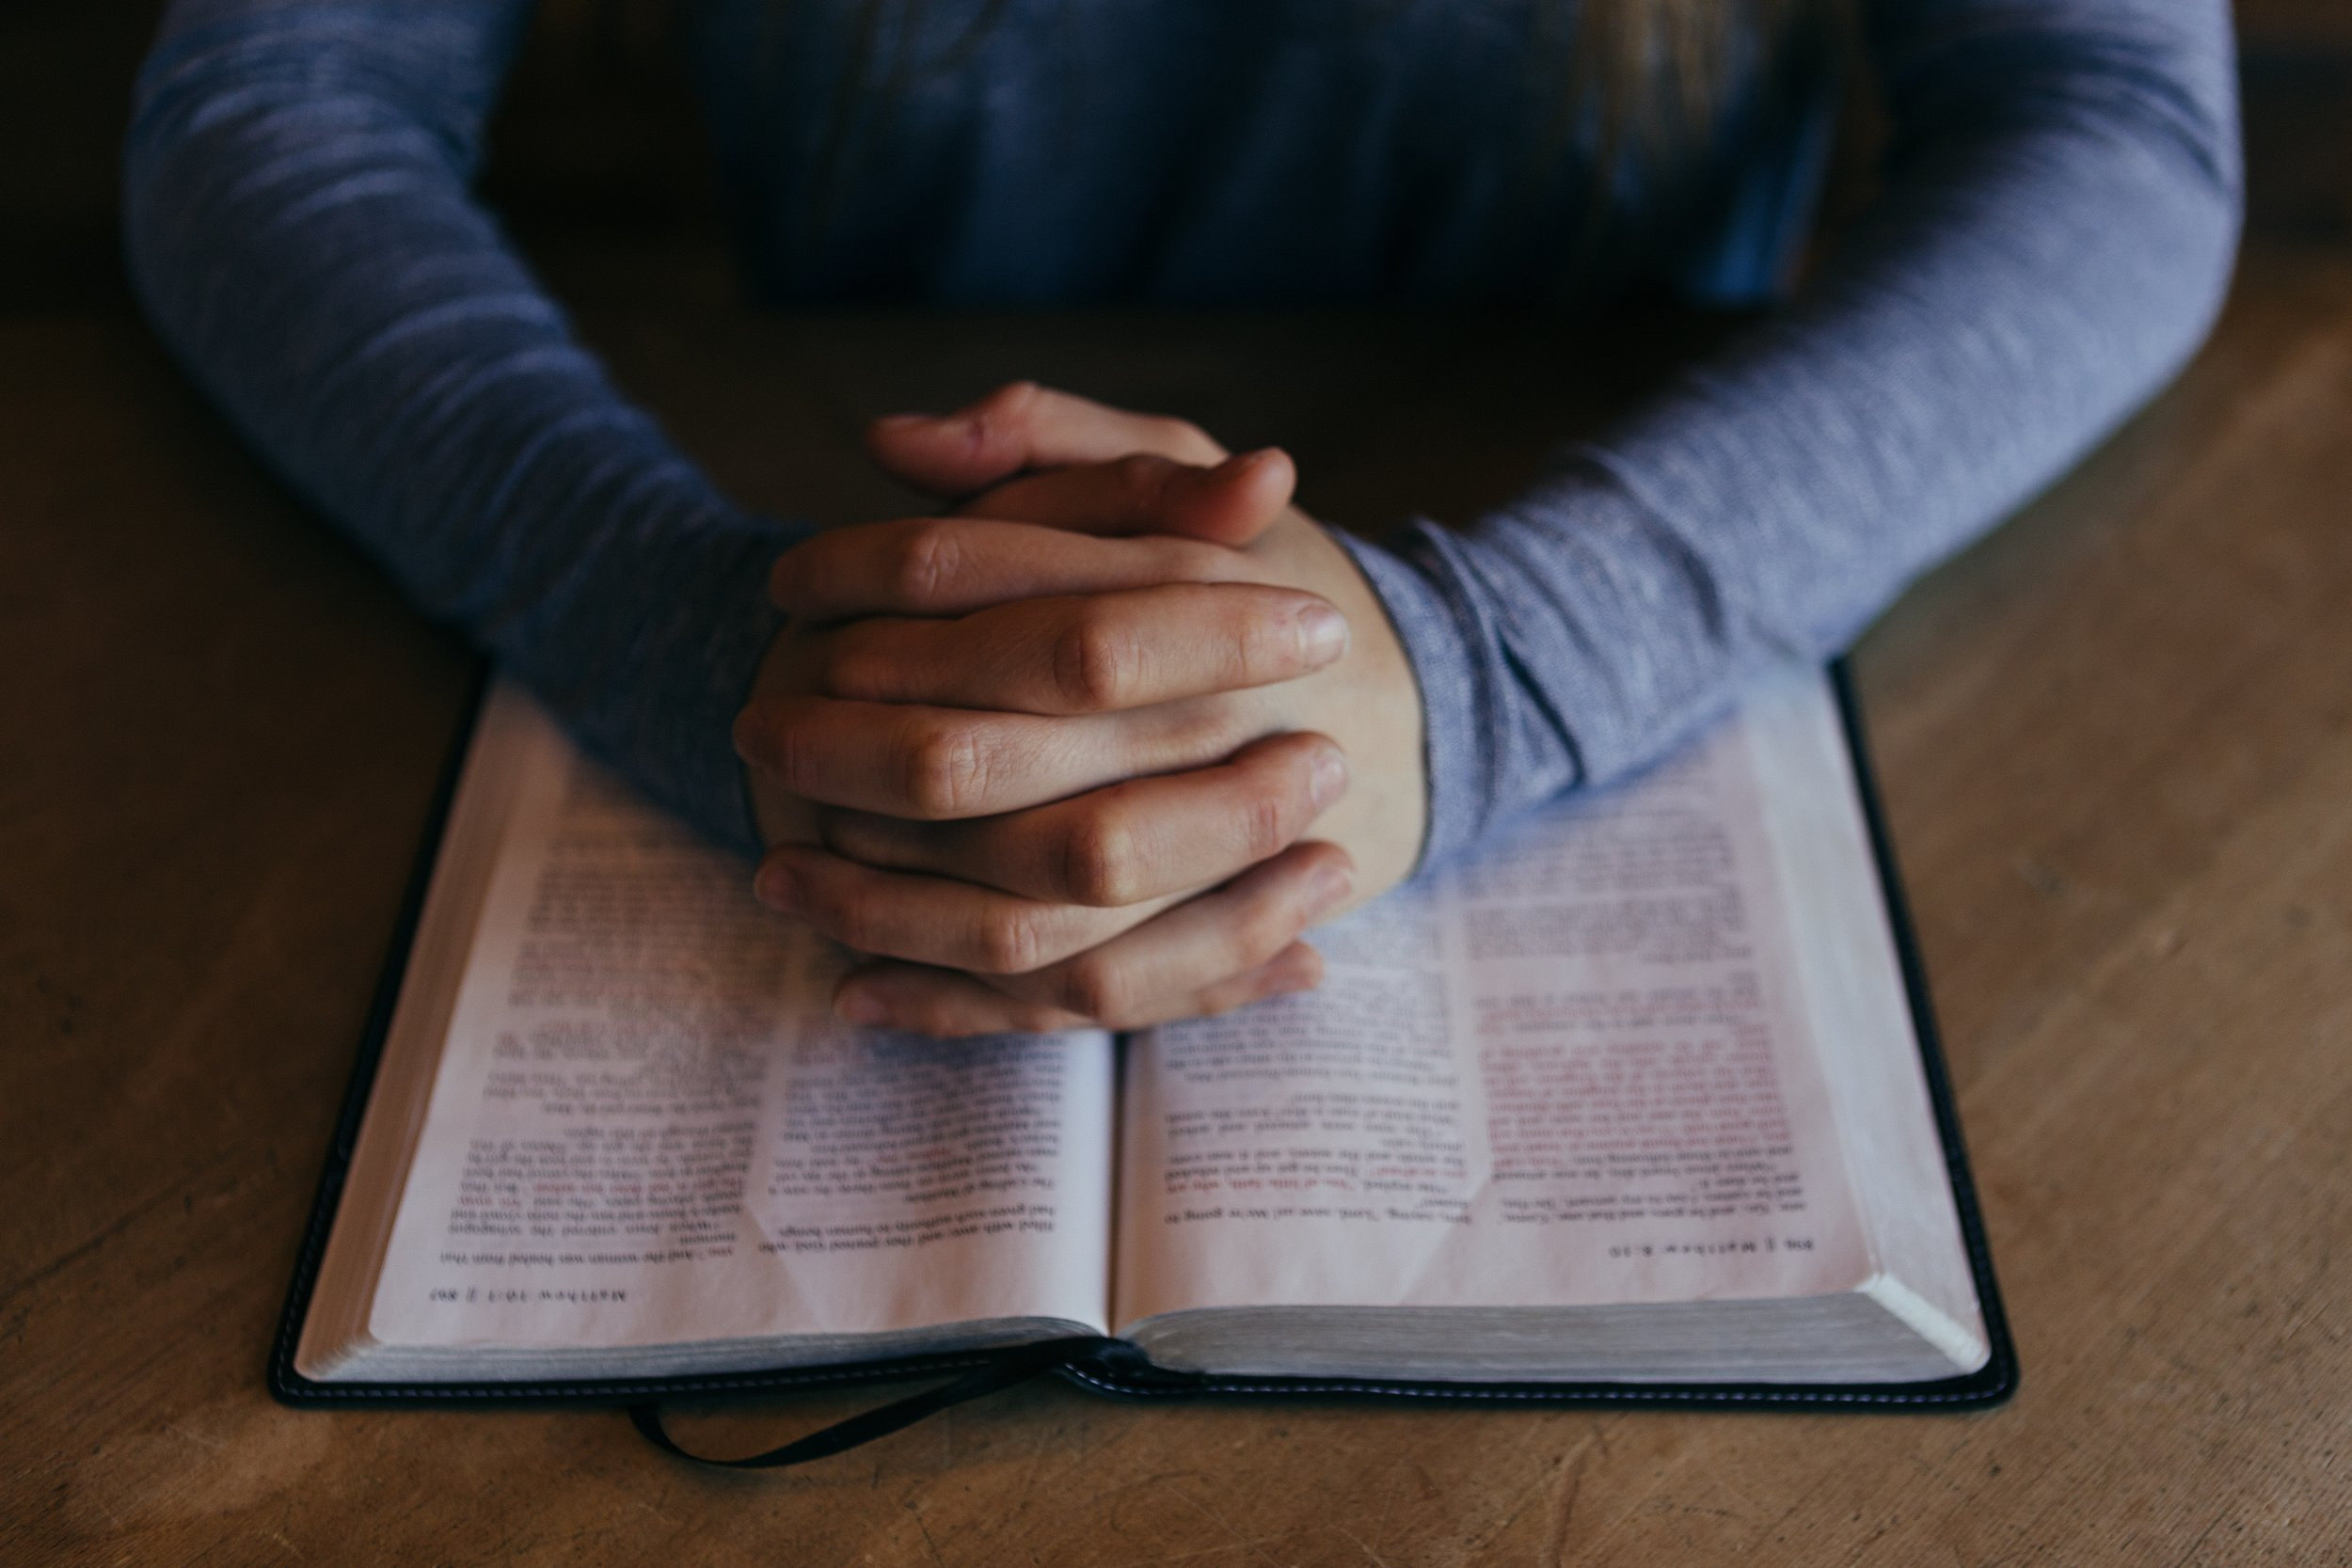 Lutheran_High_School_Association_Greater_Detroit_Michigan_LHSA_Pray.jpg